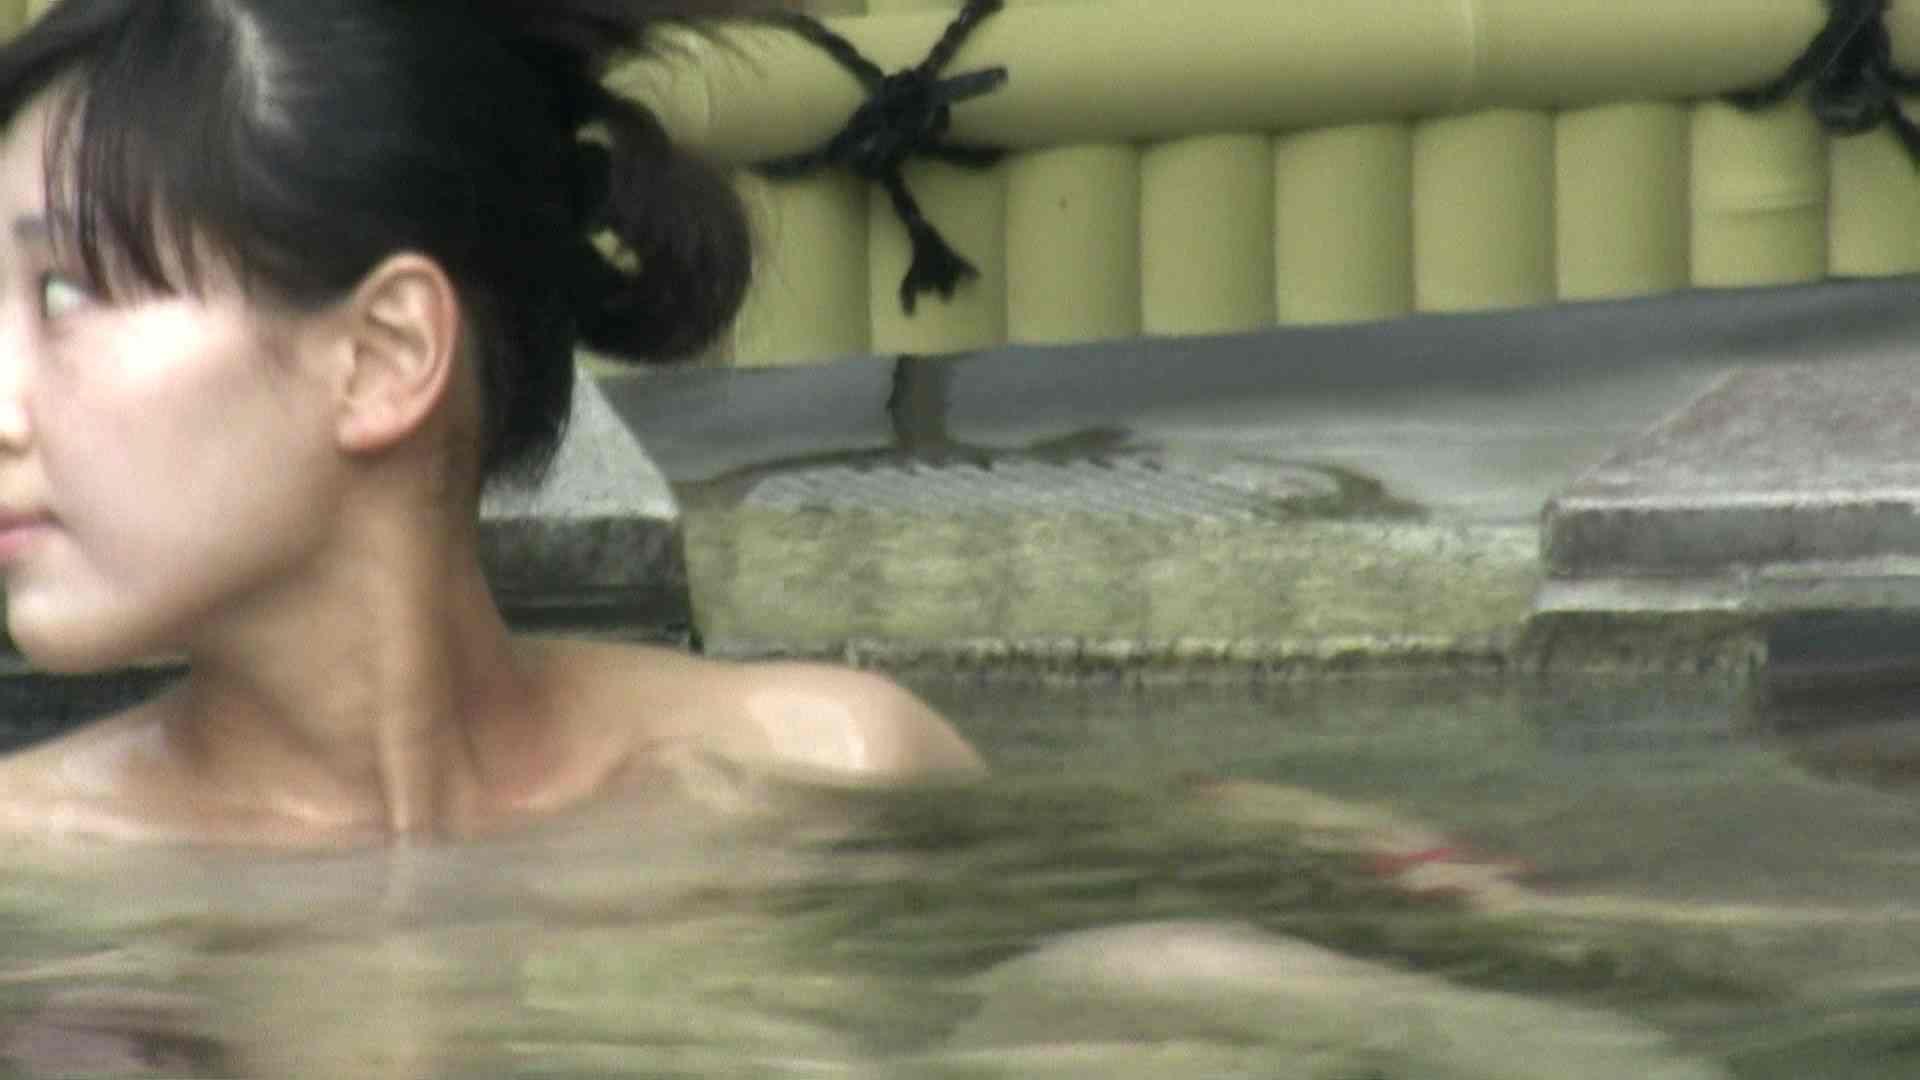 Aquaな露天風呂Vol.665 HなOL   盗撮  104pic 52